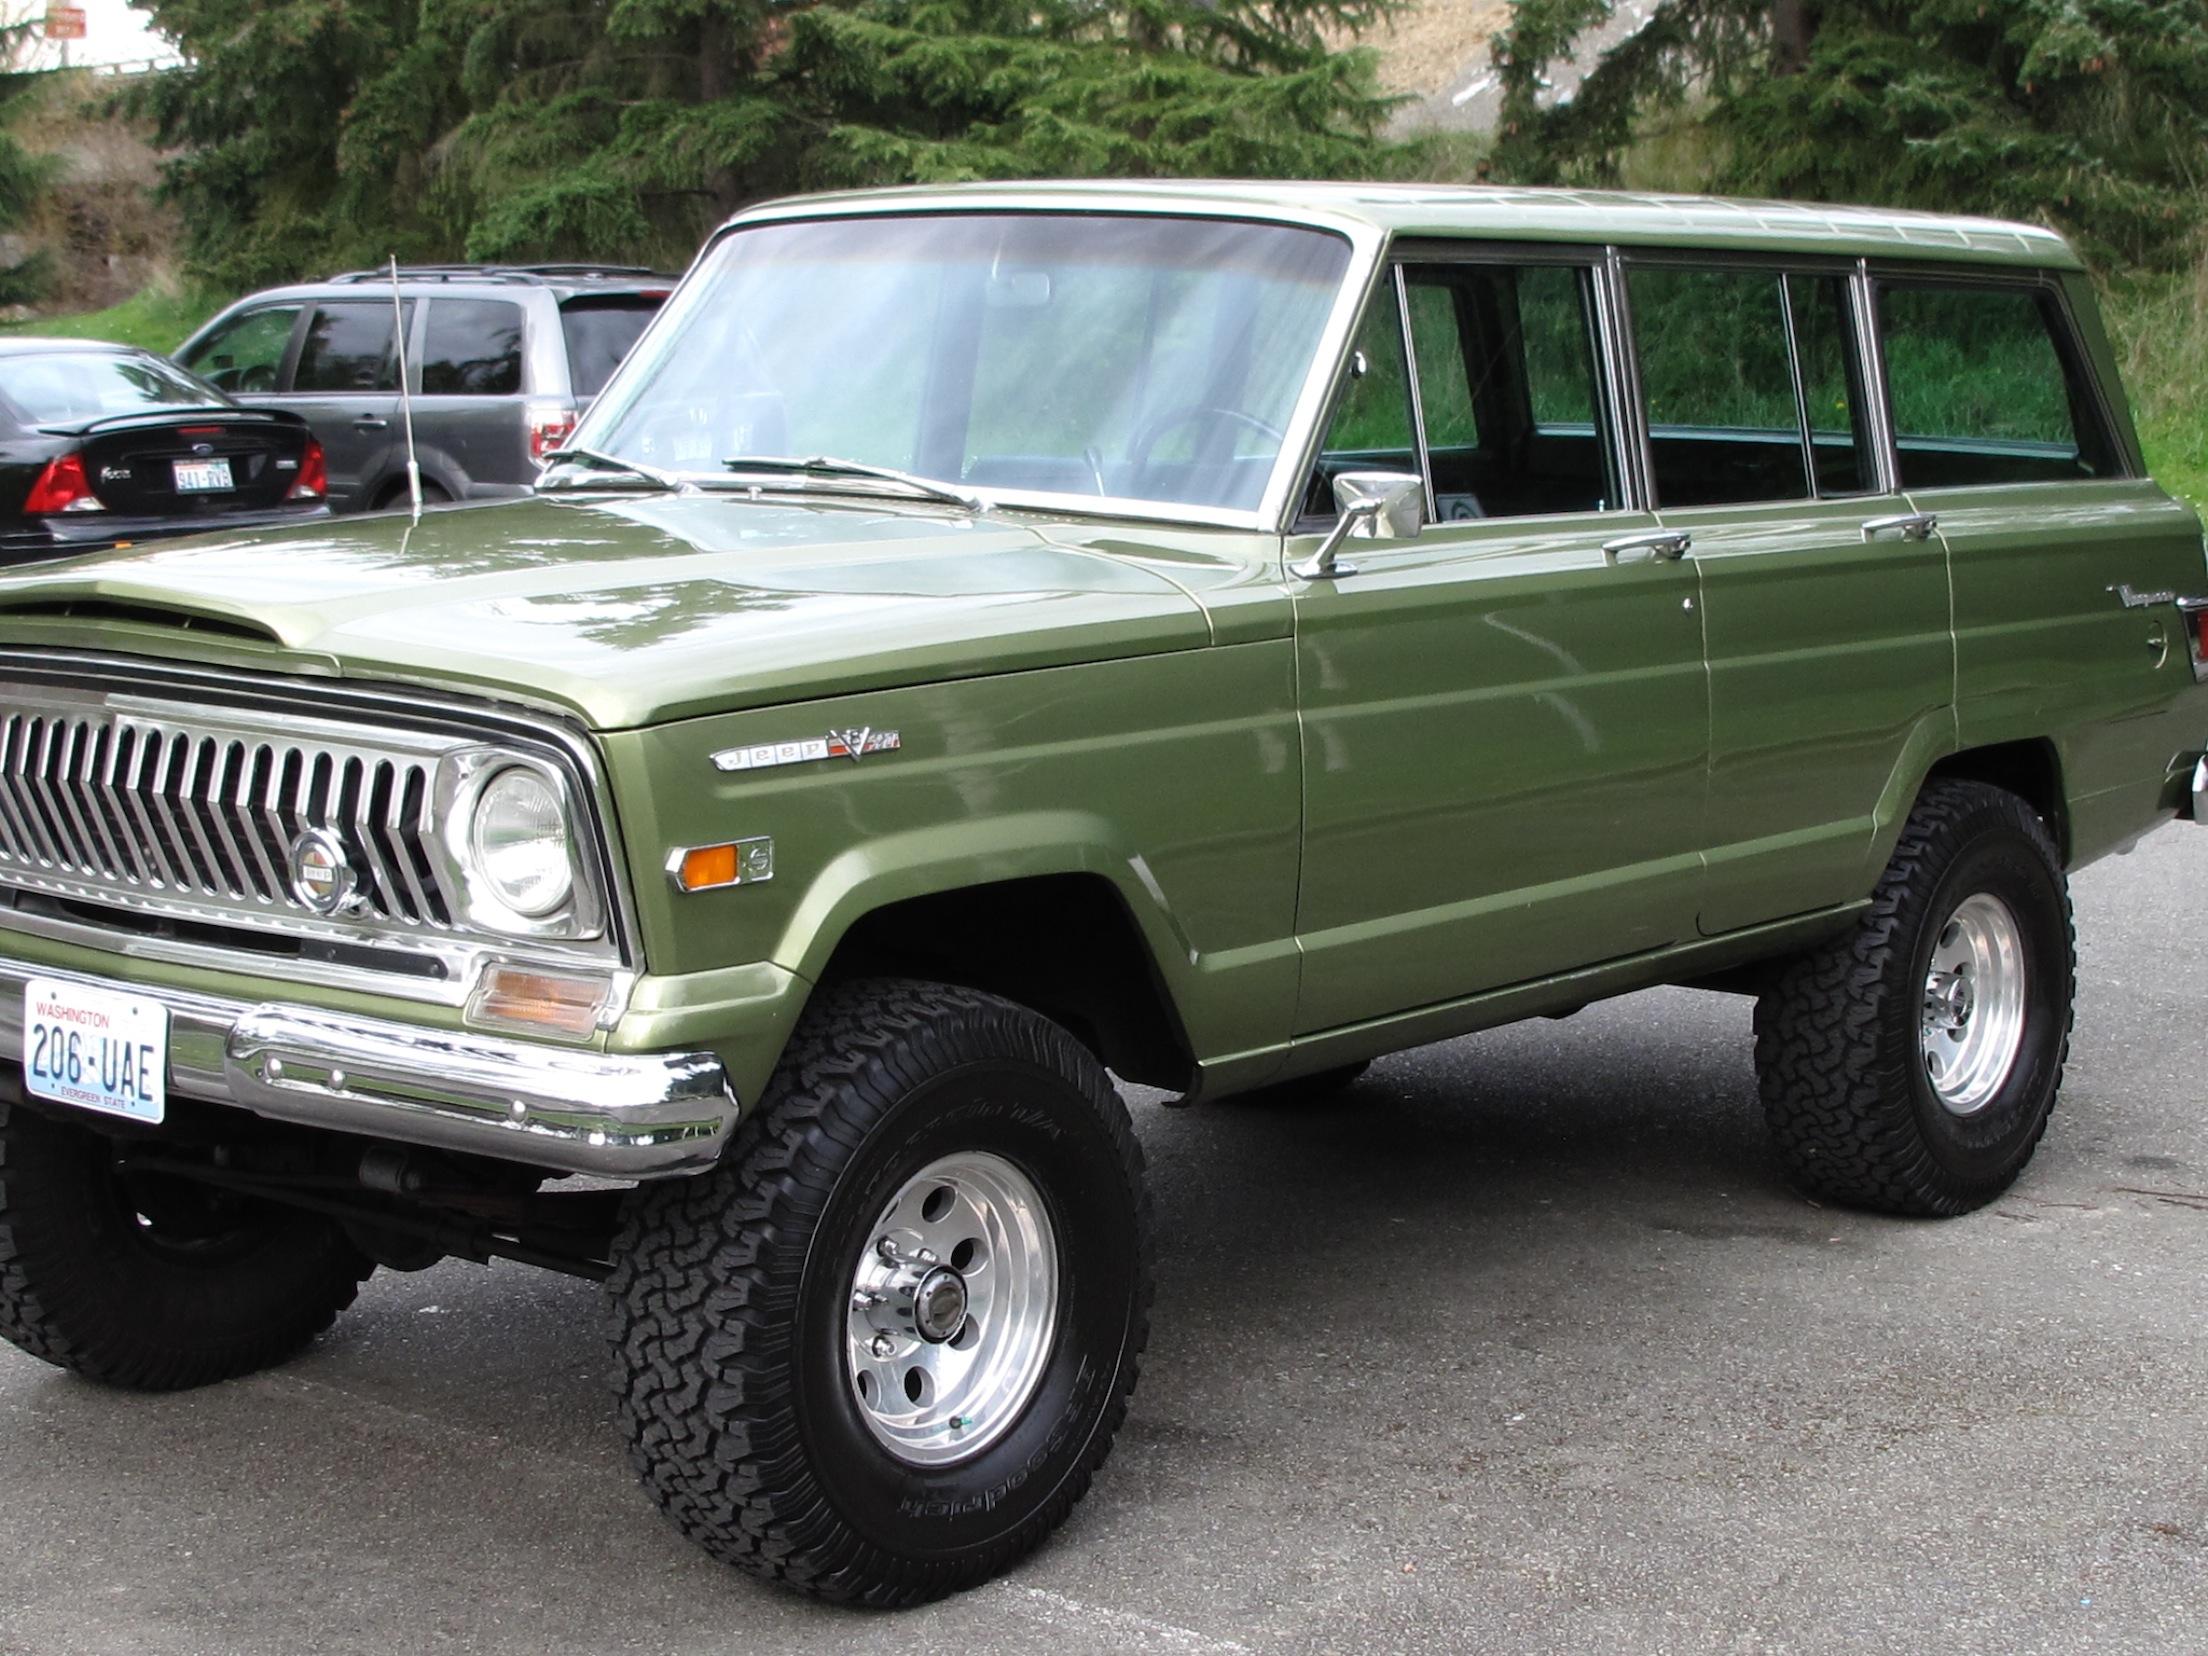 1970 Jeep Wagoneer Lifted